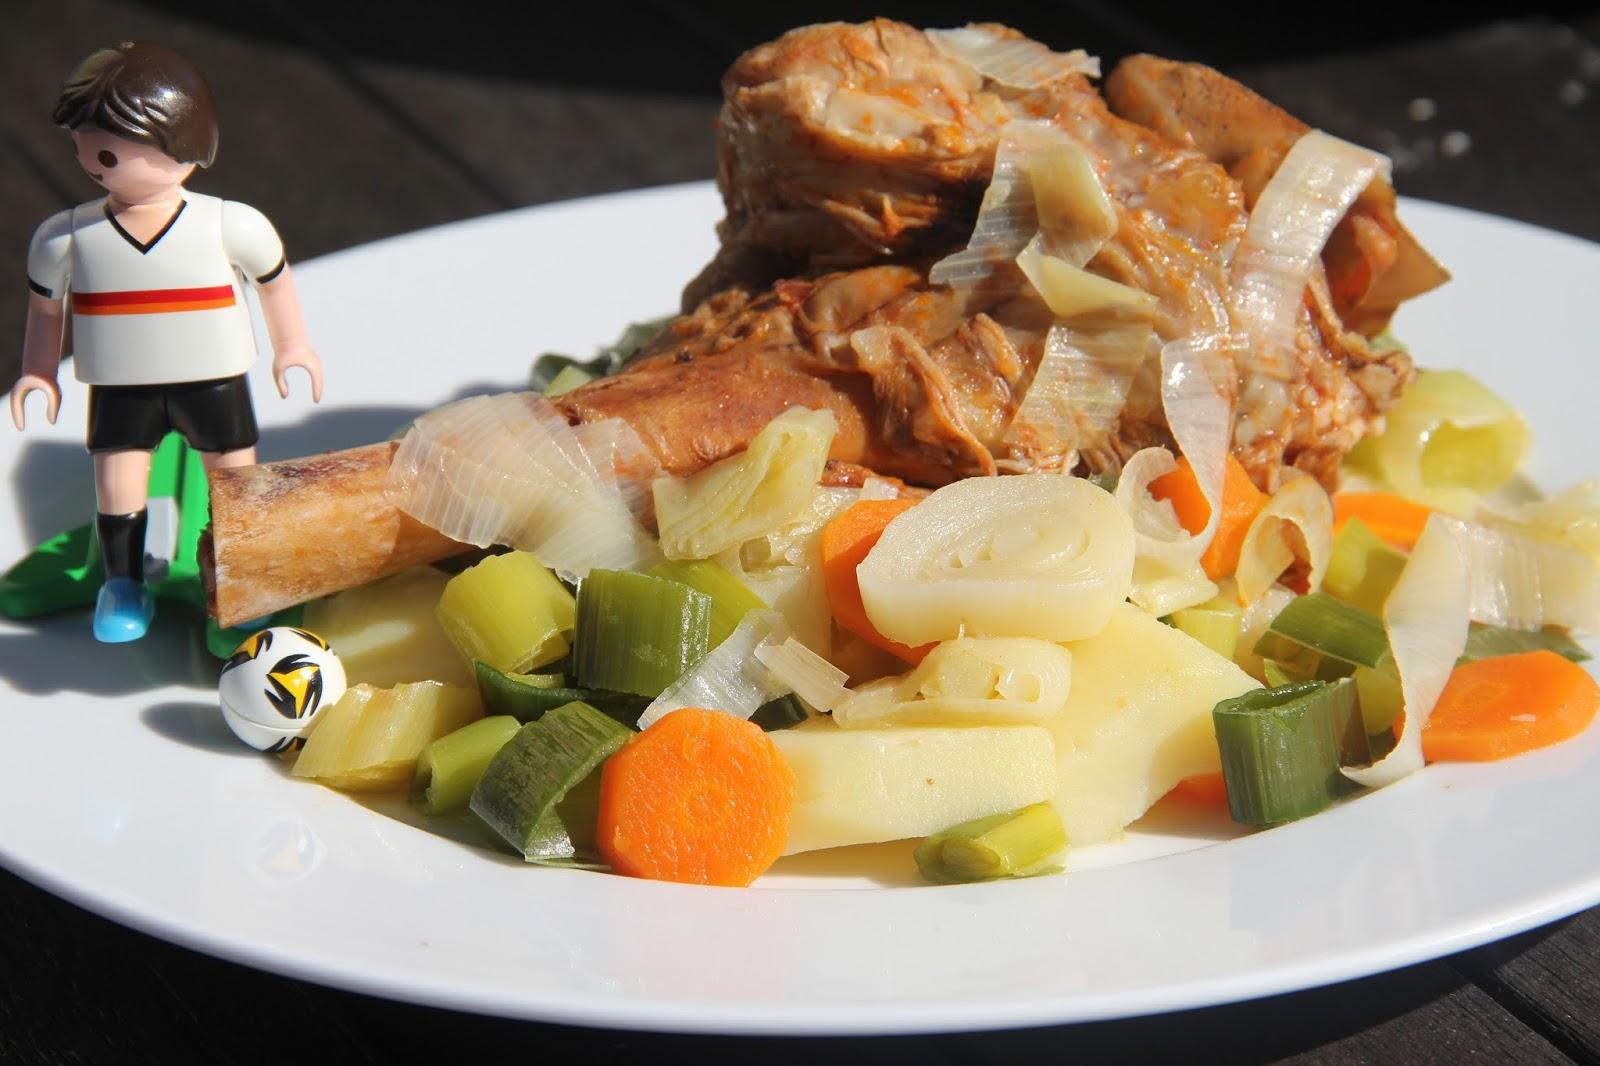 Walisische kuche - Wandschablone kuche ...